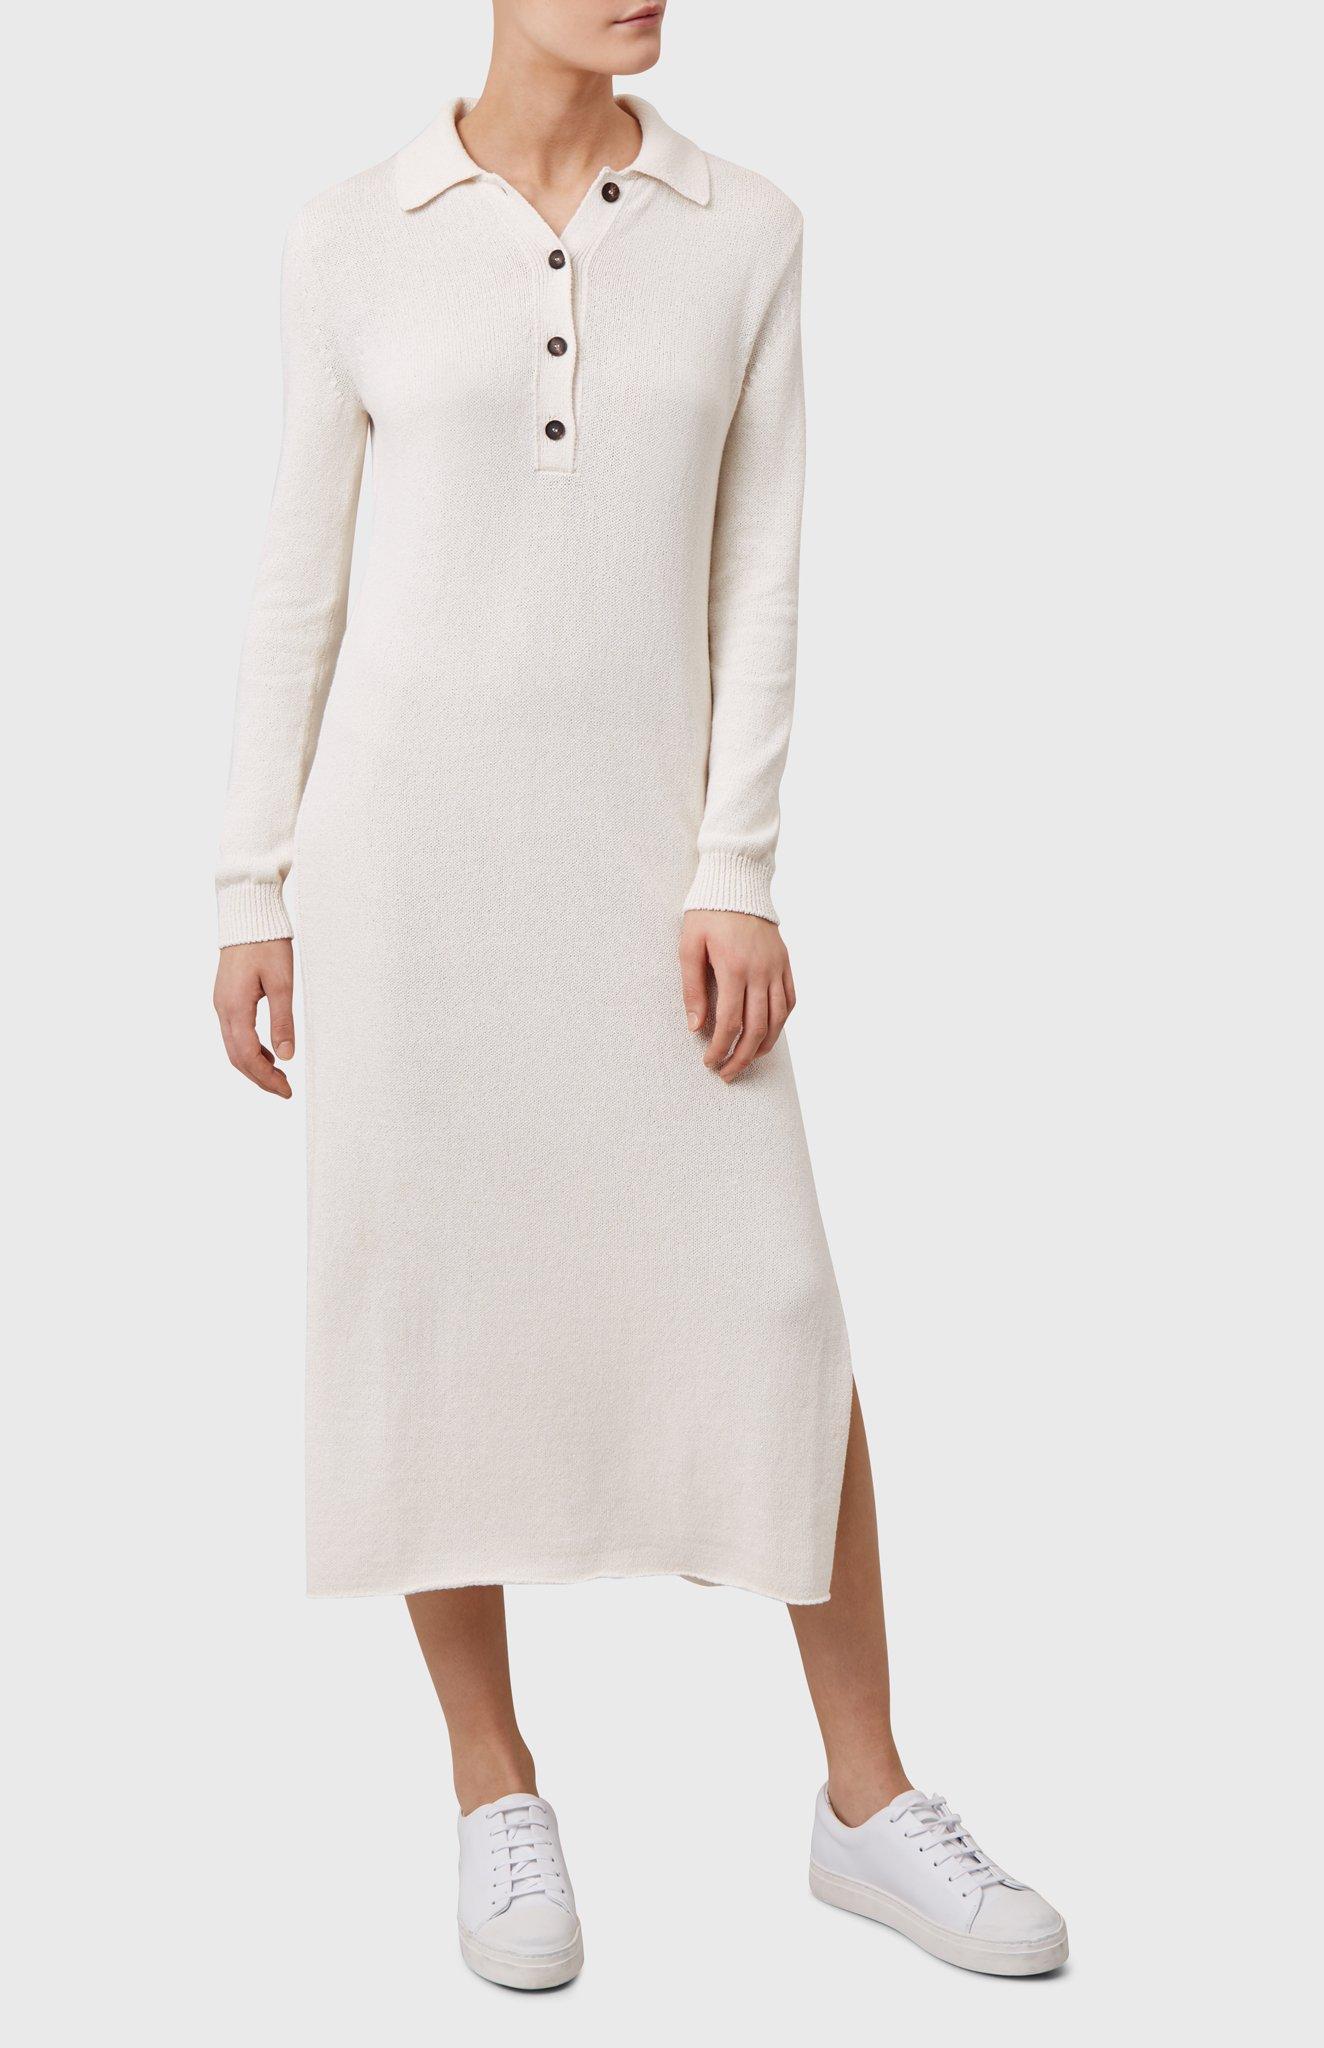 cbdb765c Off White Polo Dress Shirt   Top Mode Depot